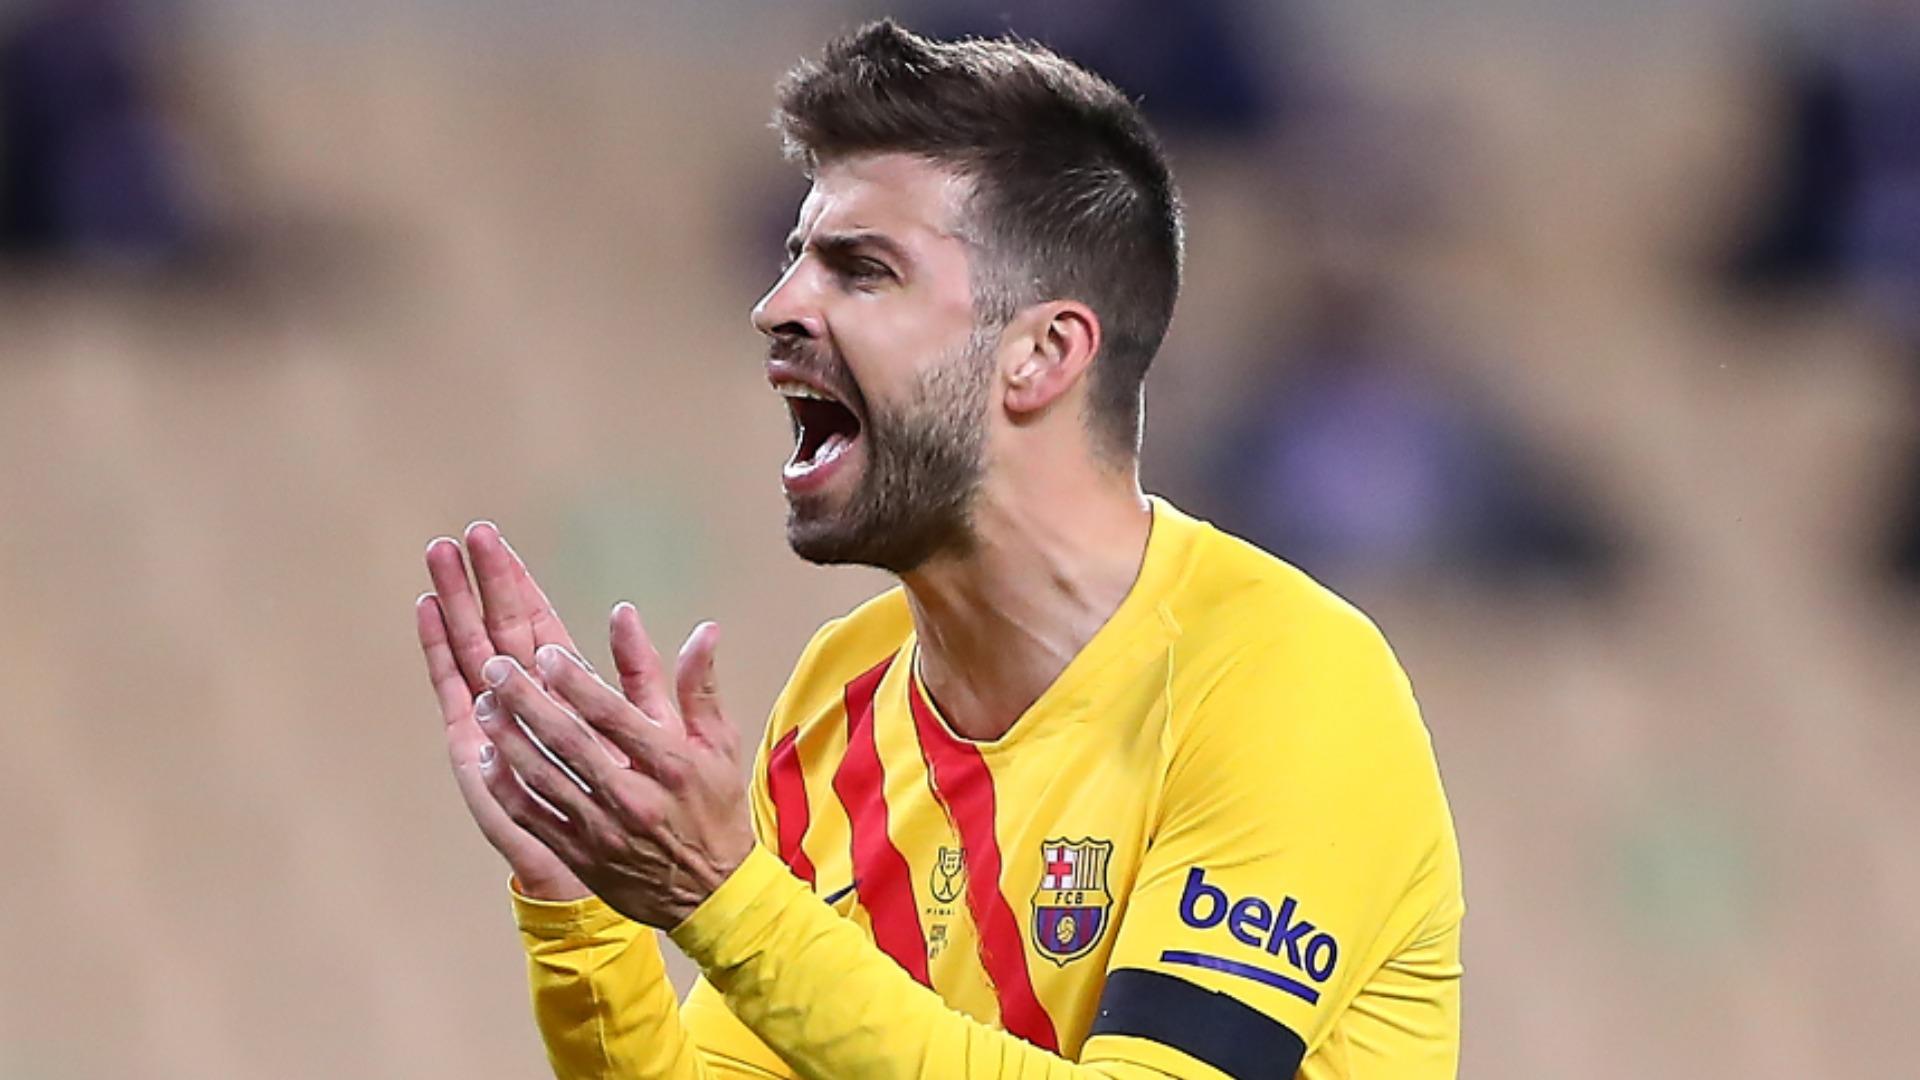 European Super League: Barcelona's Pique breaks ranks – 'Football belongs to the fans'